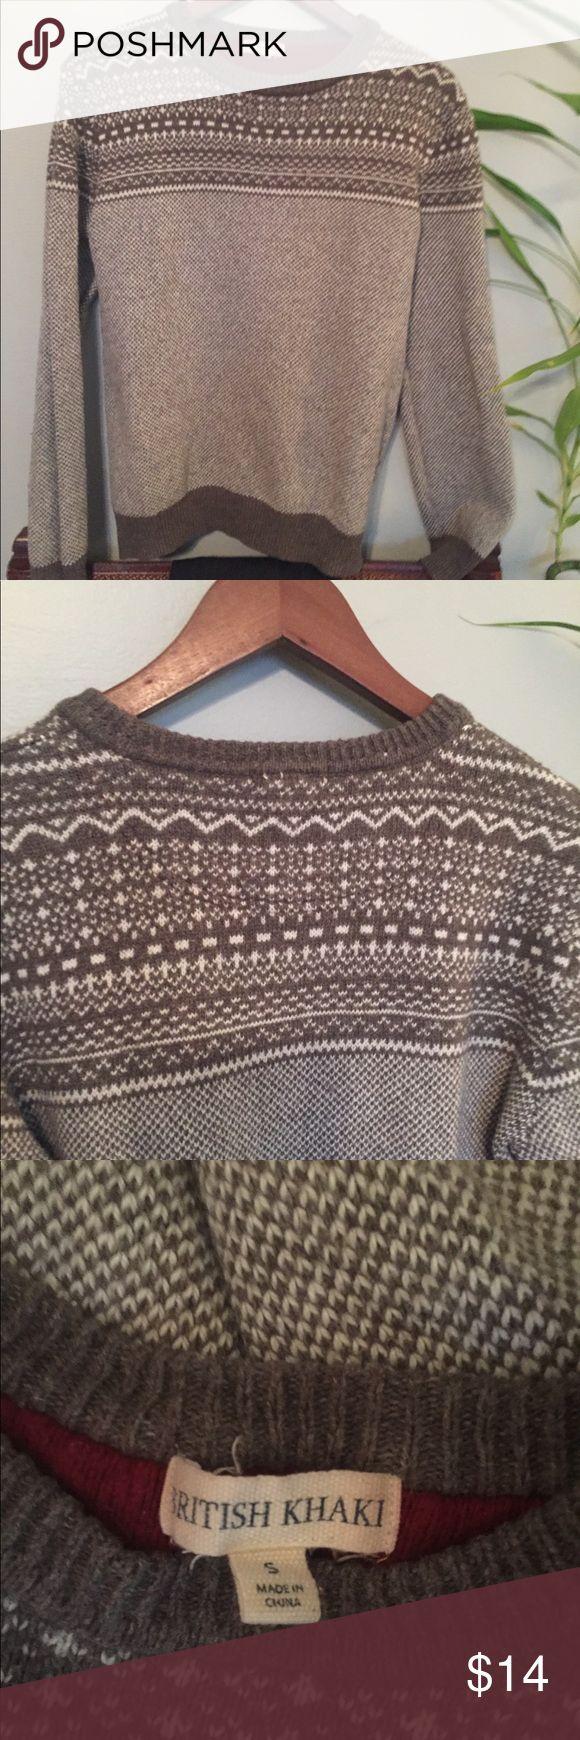 British Khaki Lambswool Sweater Perfect for those Snowy Days! GUC. Lambswool Blend. Super Soft! British Khaki Sweaters Crew & Scoop Necks